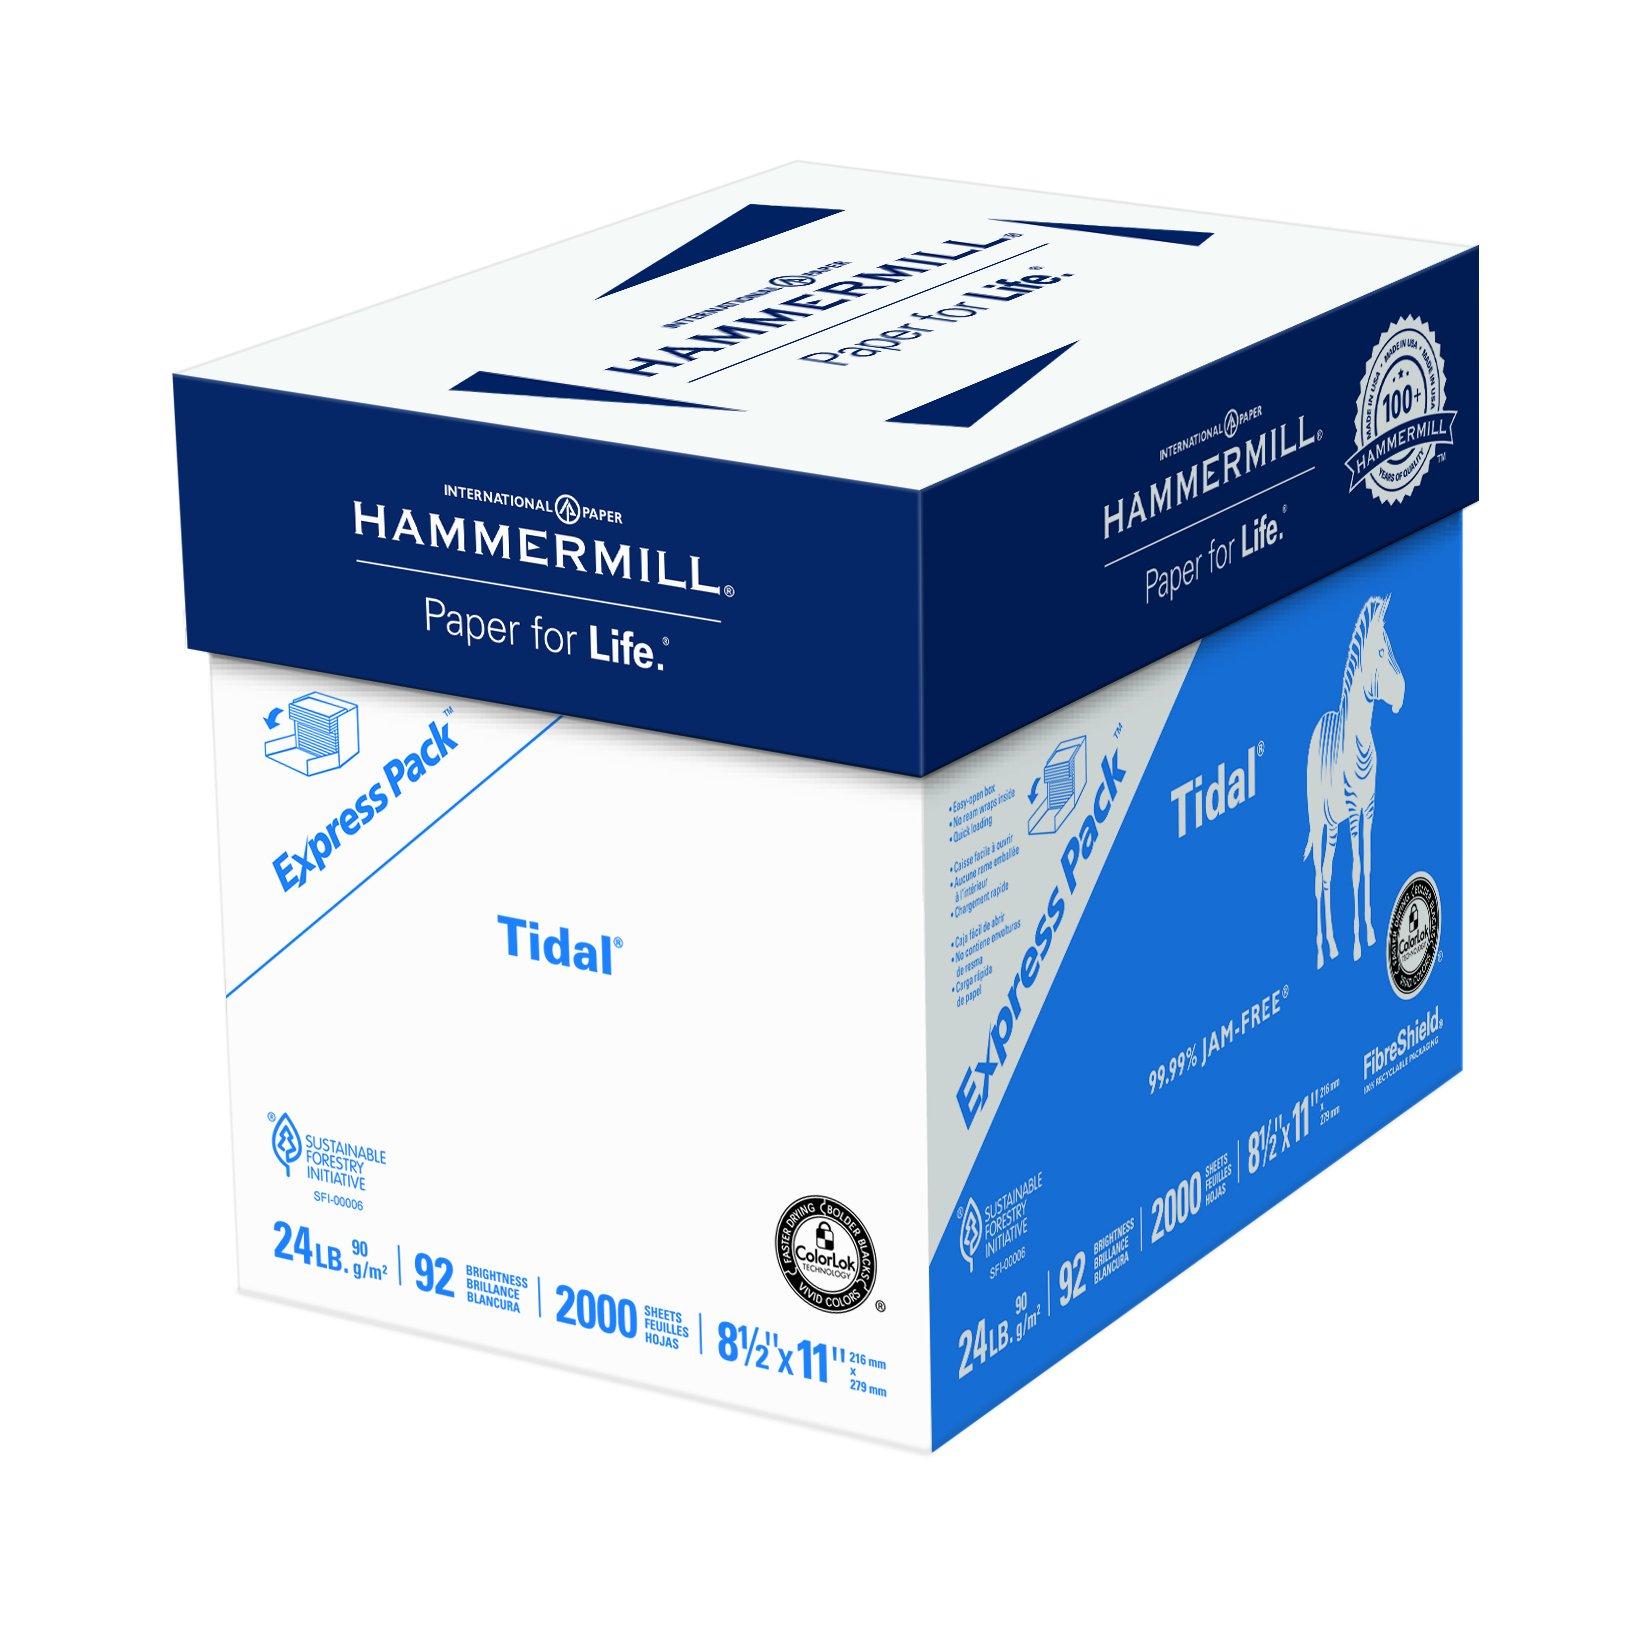 Hammermill Paper, Tidal Copy Paper, 8.5 x 11 Paper, Letter Size, 24lb Paper, 92 Bright, Express Pack / 2,000 Sheets NO REAM WRAP (162350C) Acid Free Paper